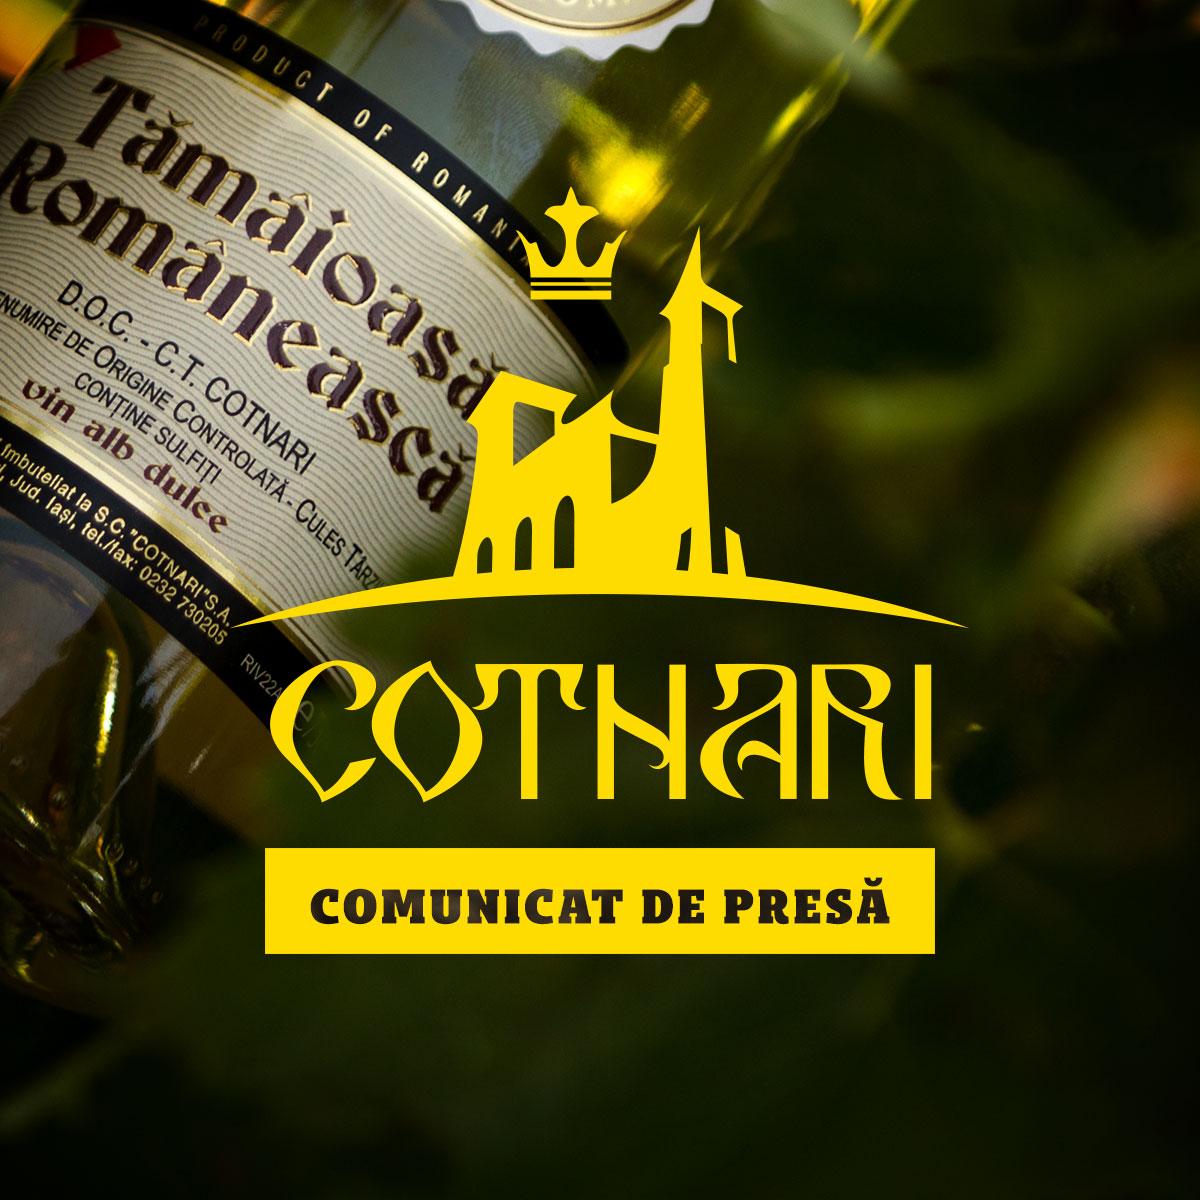 https://www.cotnari.ro/continut/uploads/2017/08/comunicat10.jpg